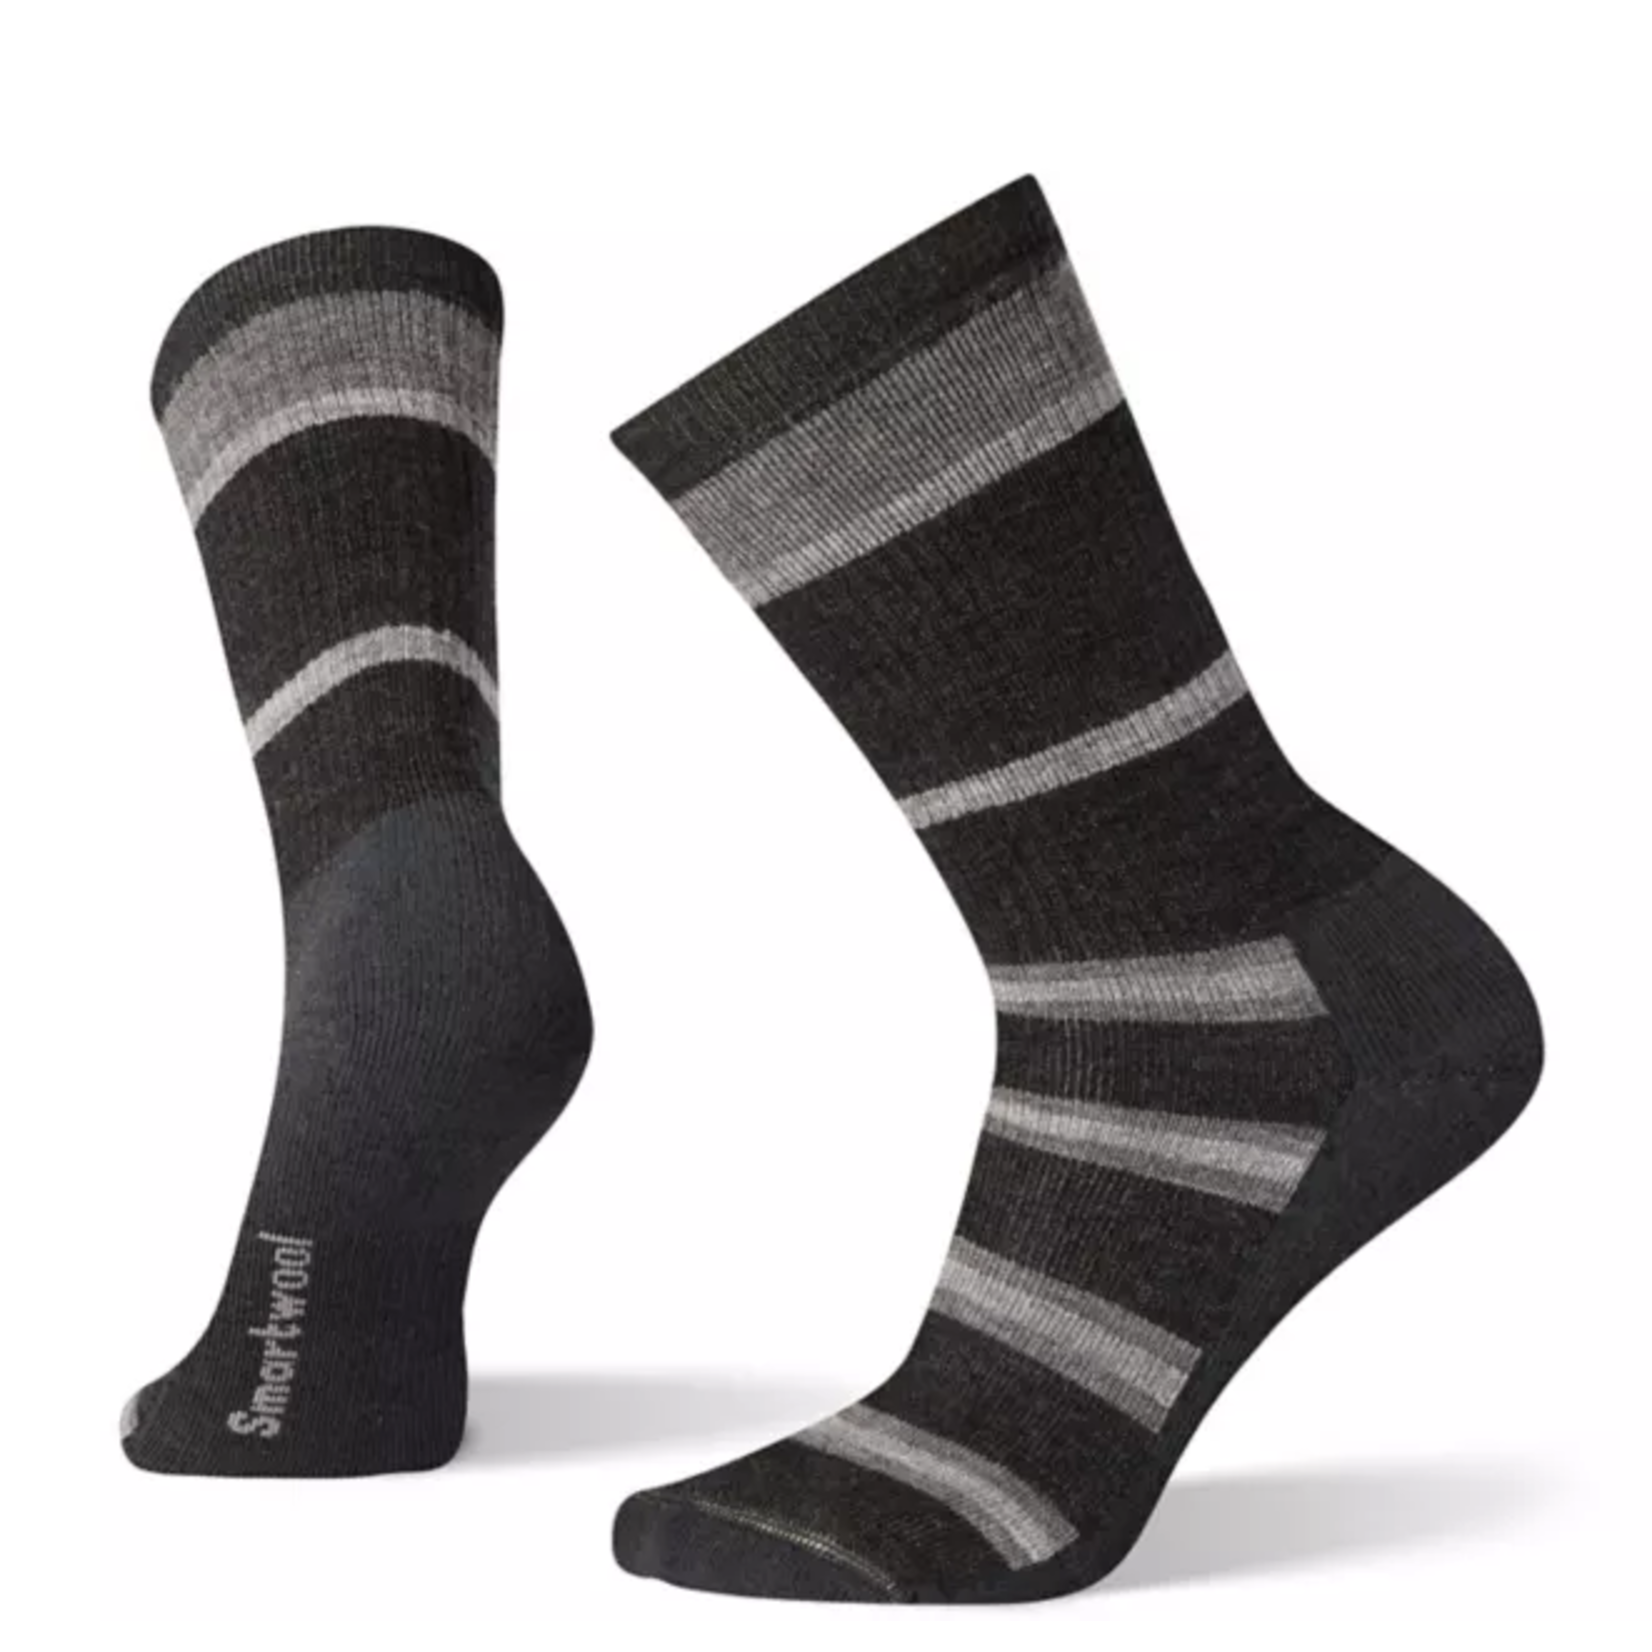 Smartwool Men's Striped Medium Hiking Crew Socks